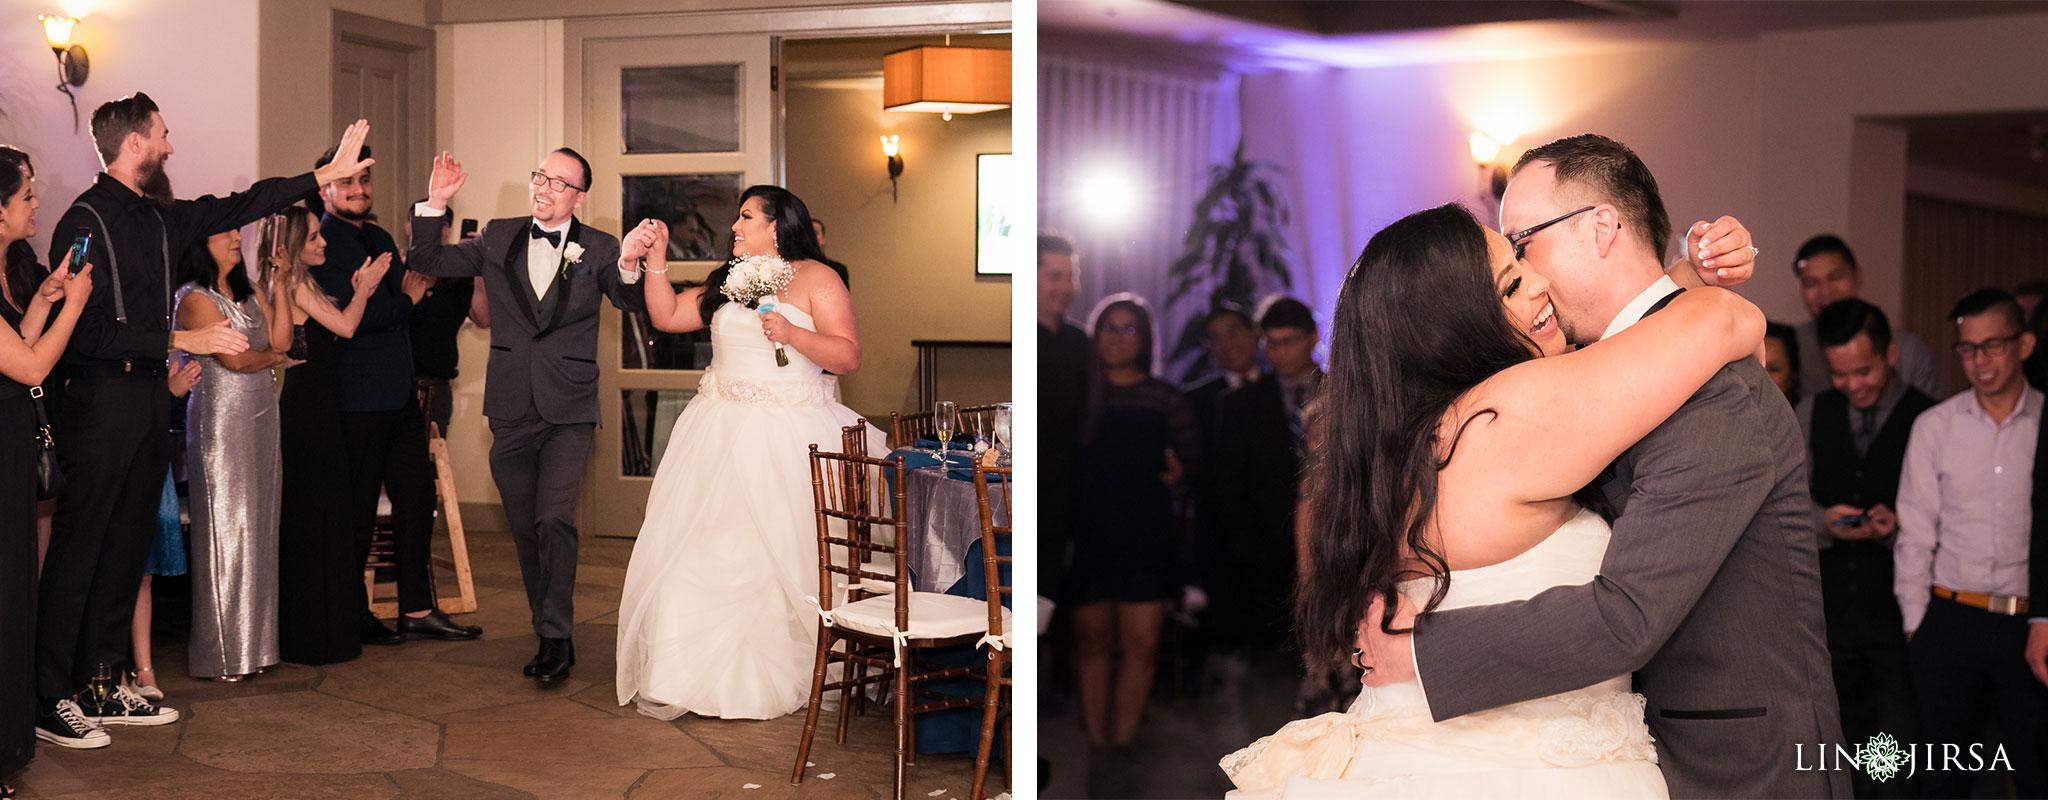 32 turnip rose promenade orange county wedding reception photography